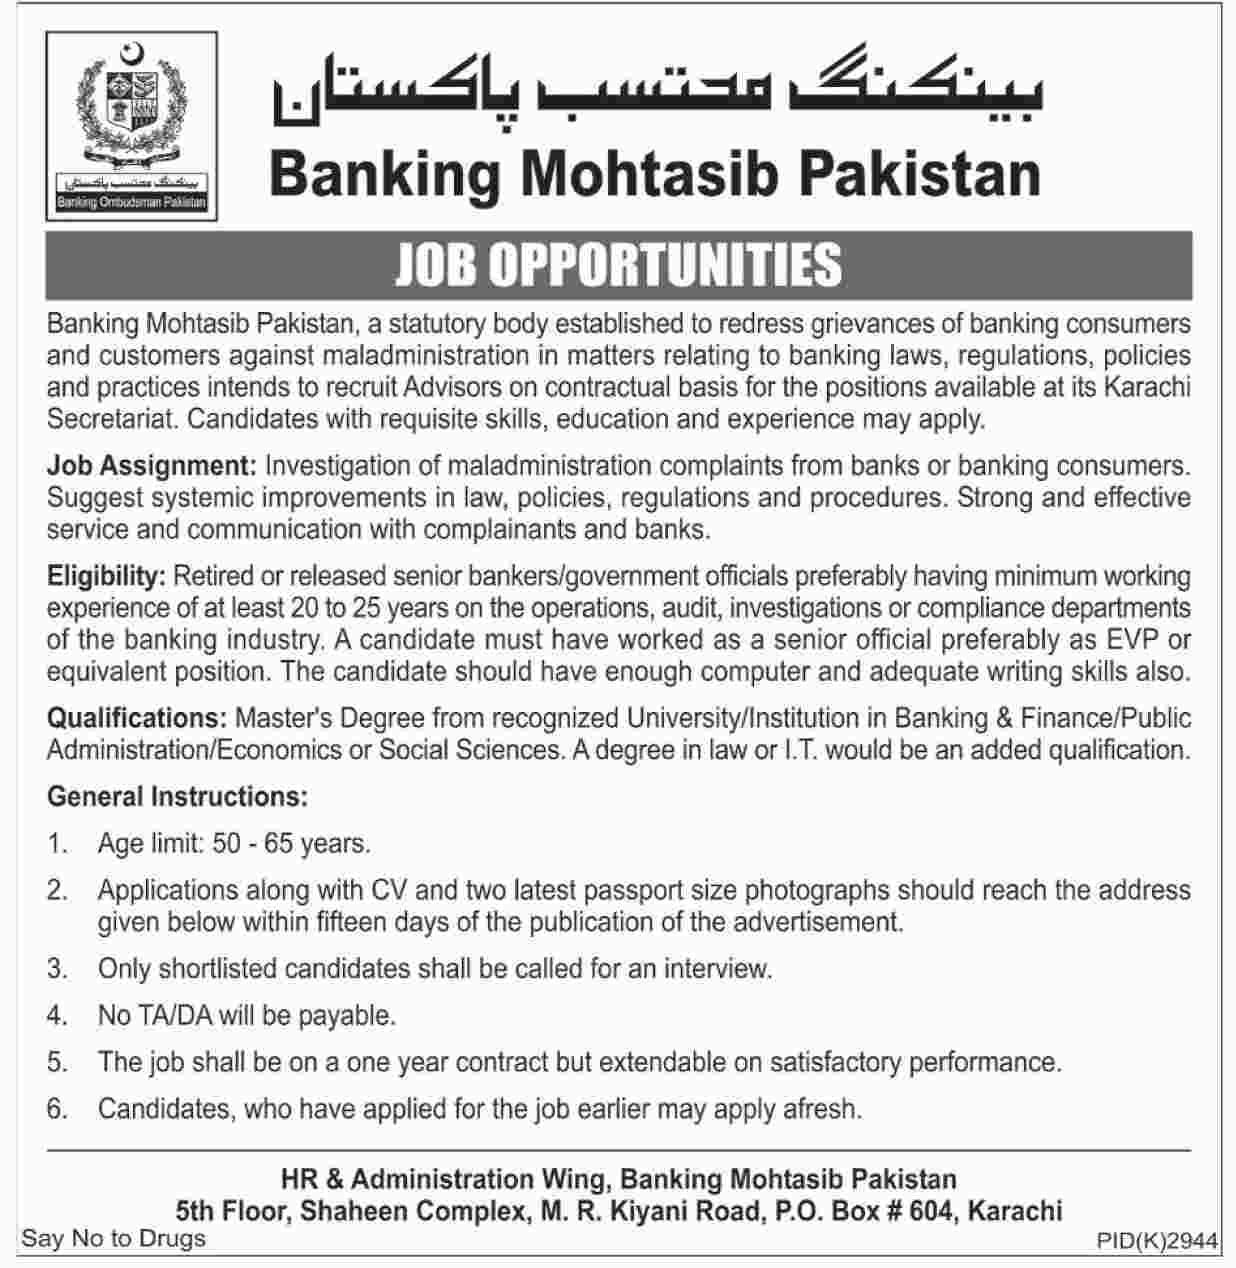 Banking Mohtasib Pakistan Announced Jobs in Karachi